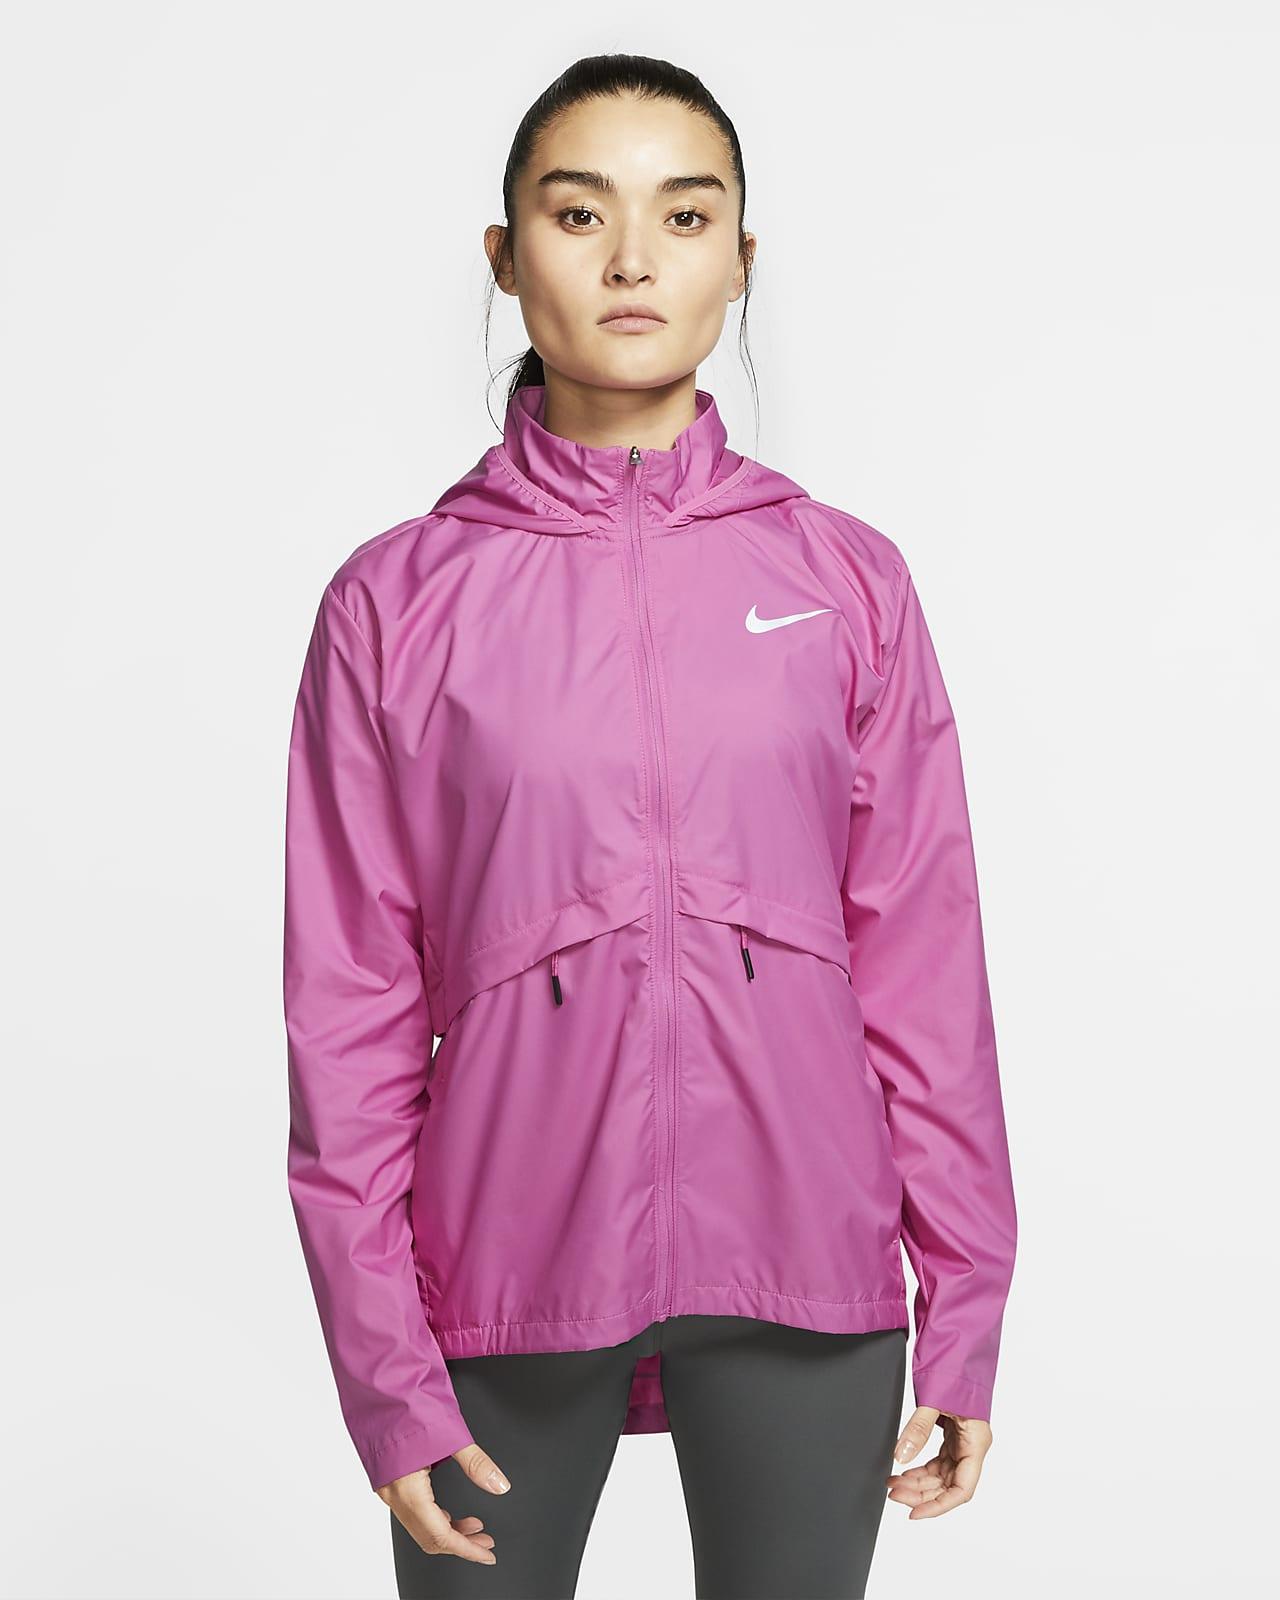 Nike Essential Women's Packable Running Rain Jacket